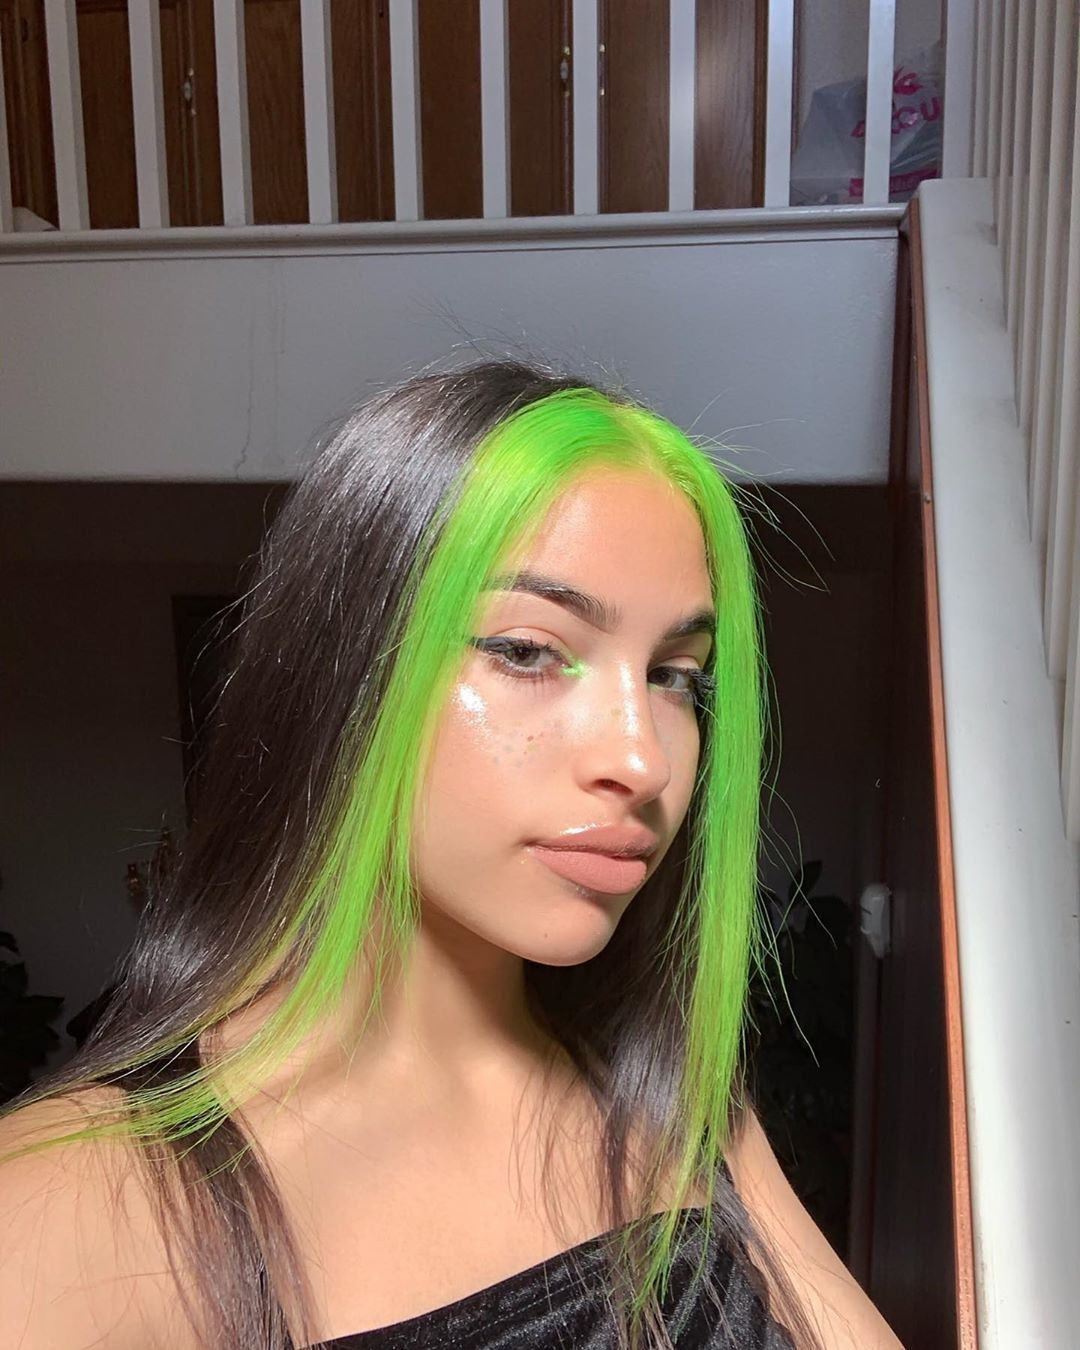 Vereena Sayed Sayed Vereena Sayed Vereena In 2020 Green Hair Streaks Hair Color Streaks Hair Styles